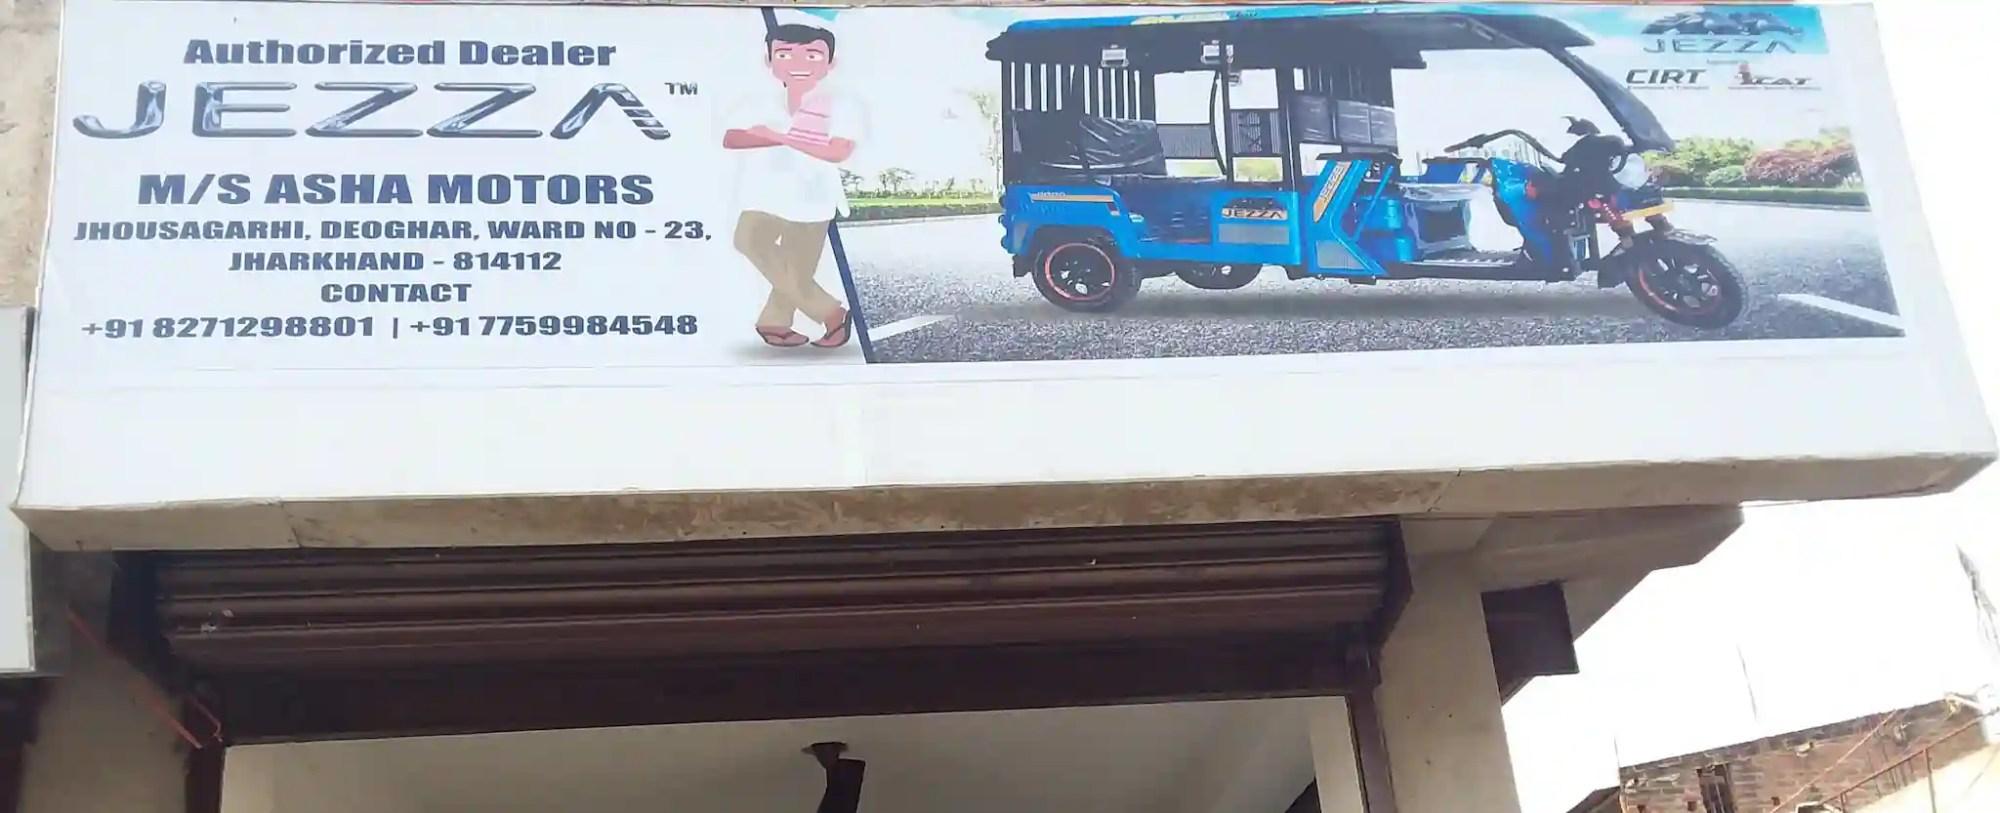 hight resolution of asha motors jhaunsagarhi battery operated auto rickshaw dealers in deoghar jharkhand justdial